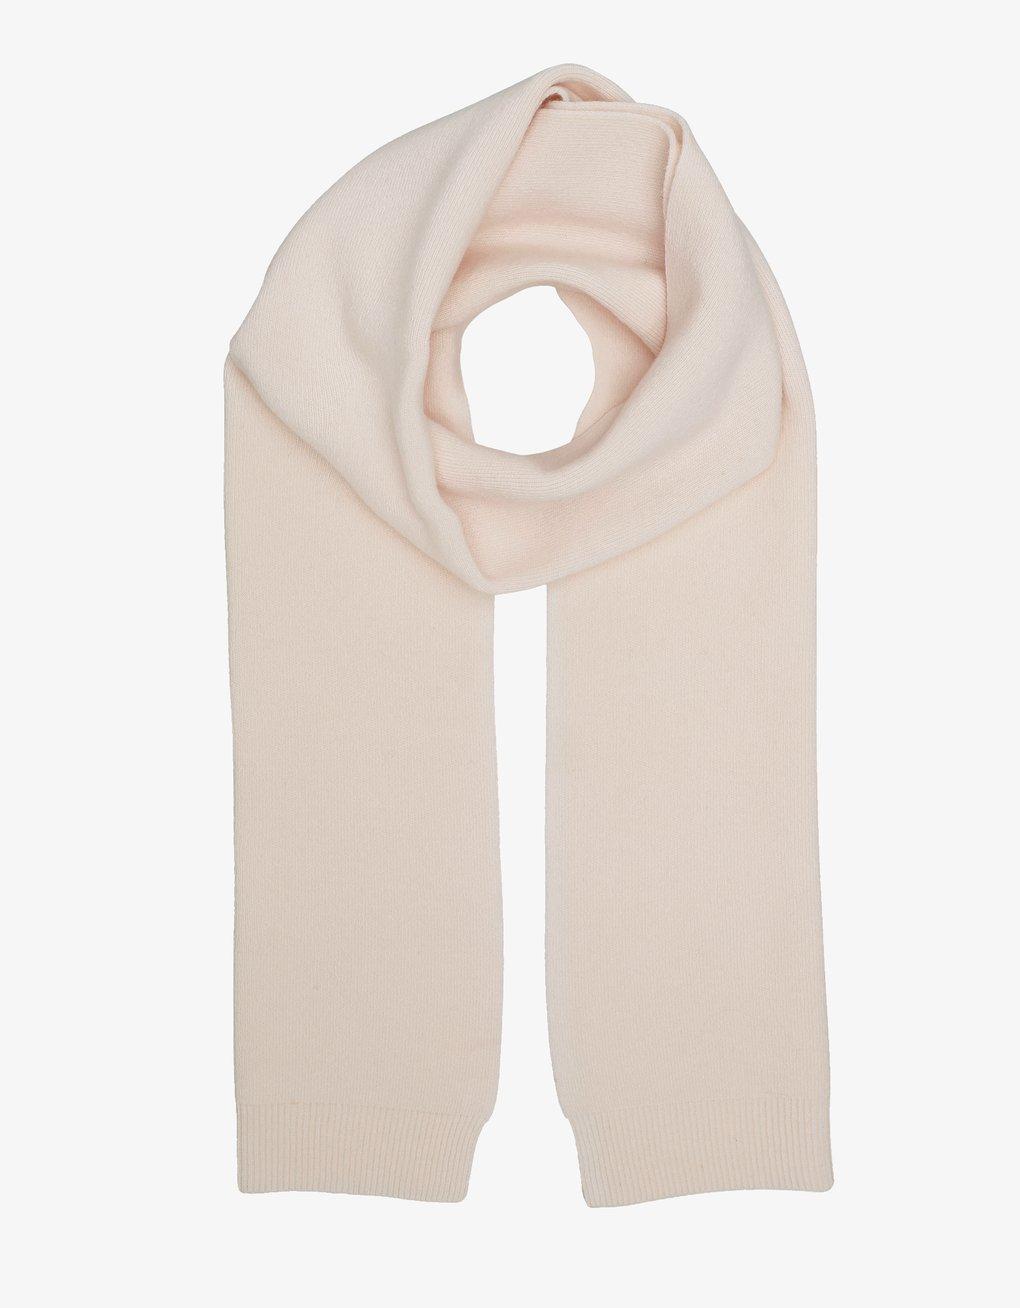 Merino wool scarf – Ivory white